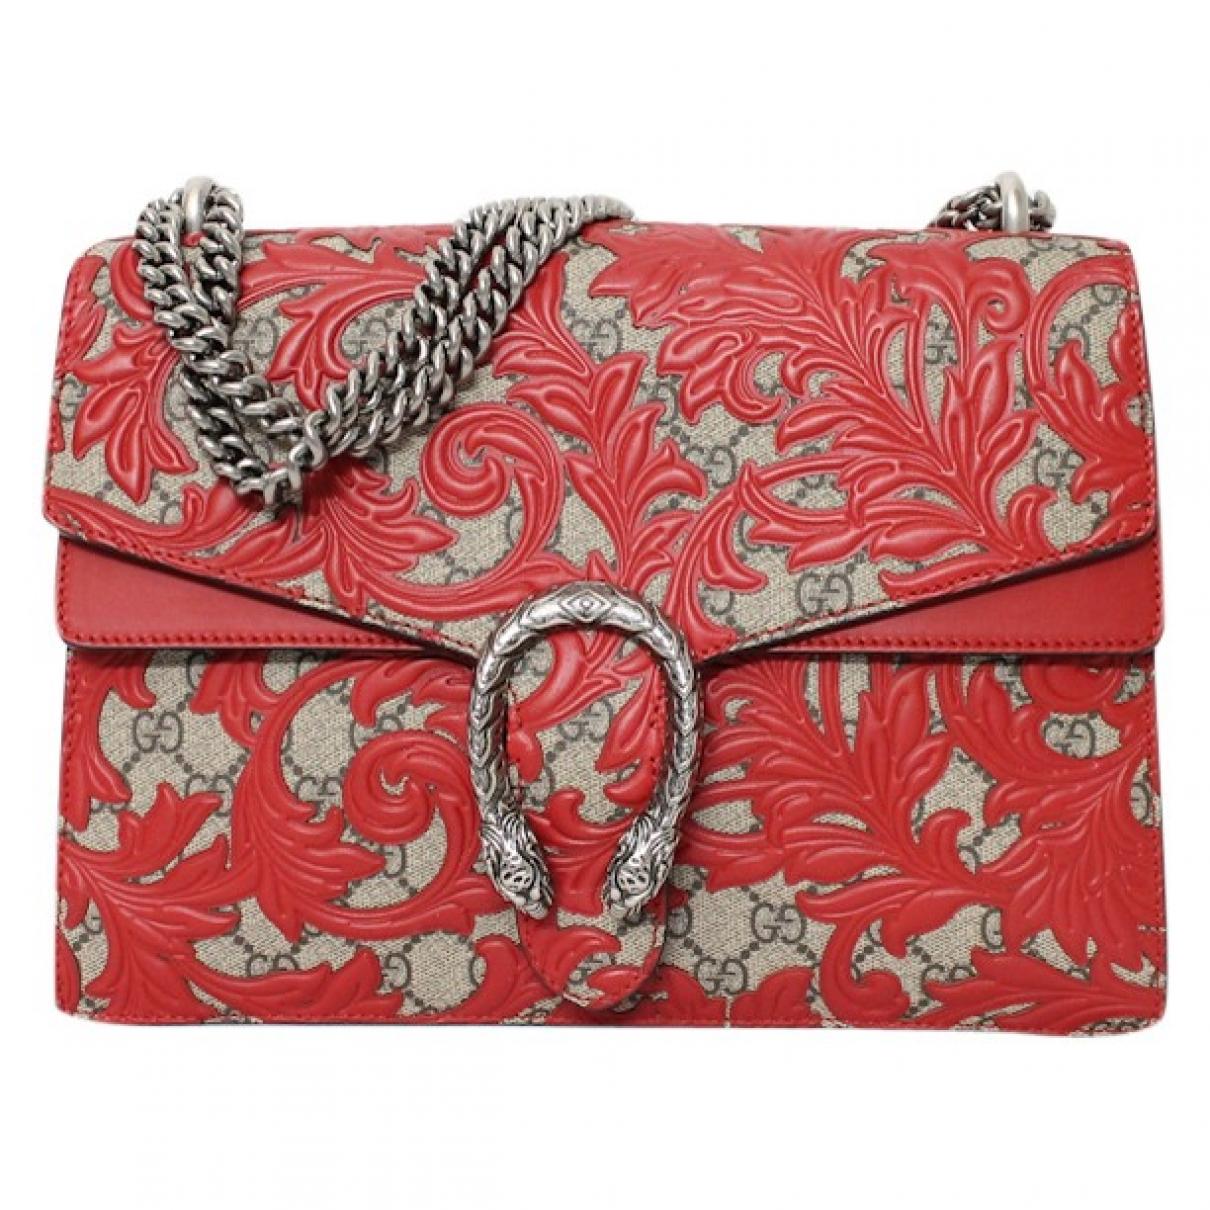 Gucci Dionysus Handtasche in  Rot Leder